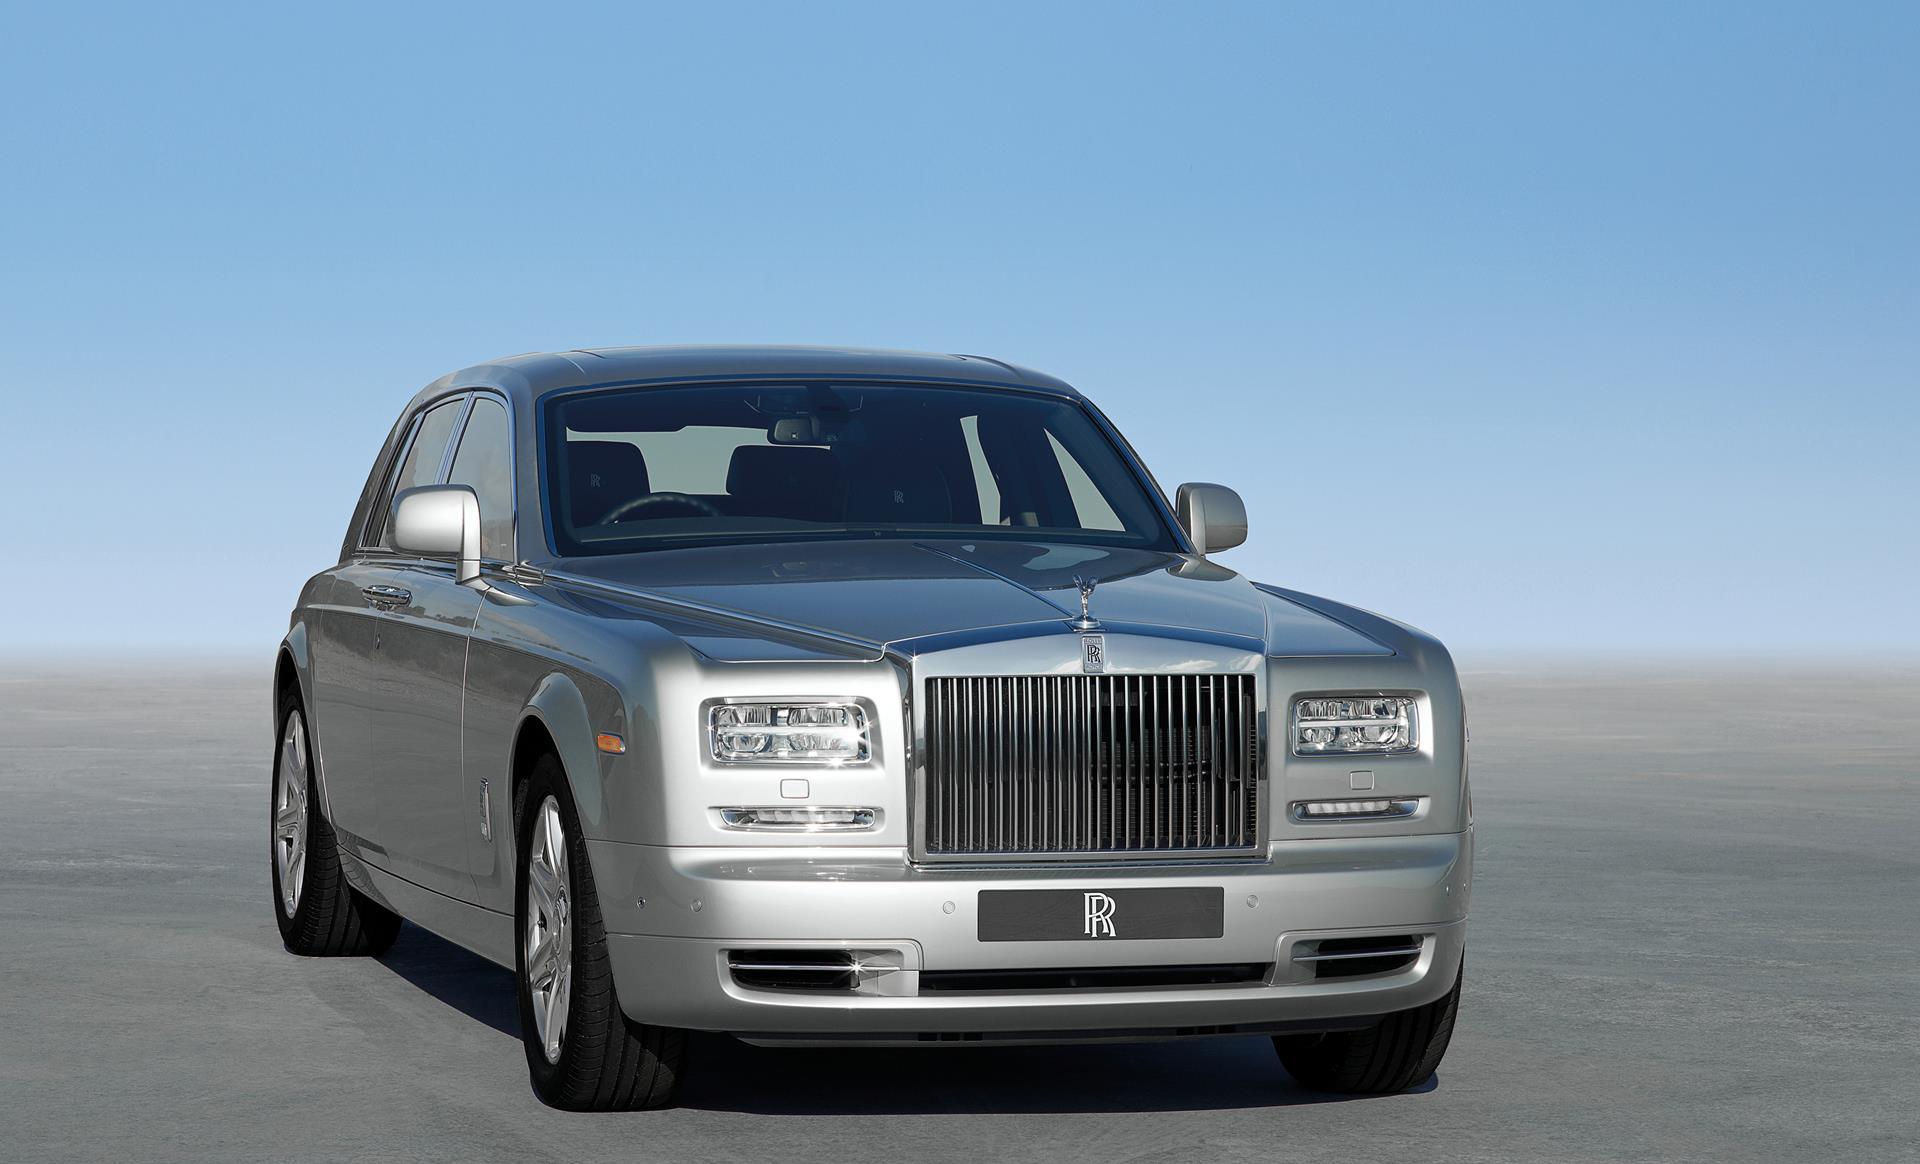 2016 Rolls-Royce Phantom - conceptcarz.com